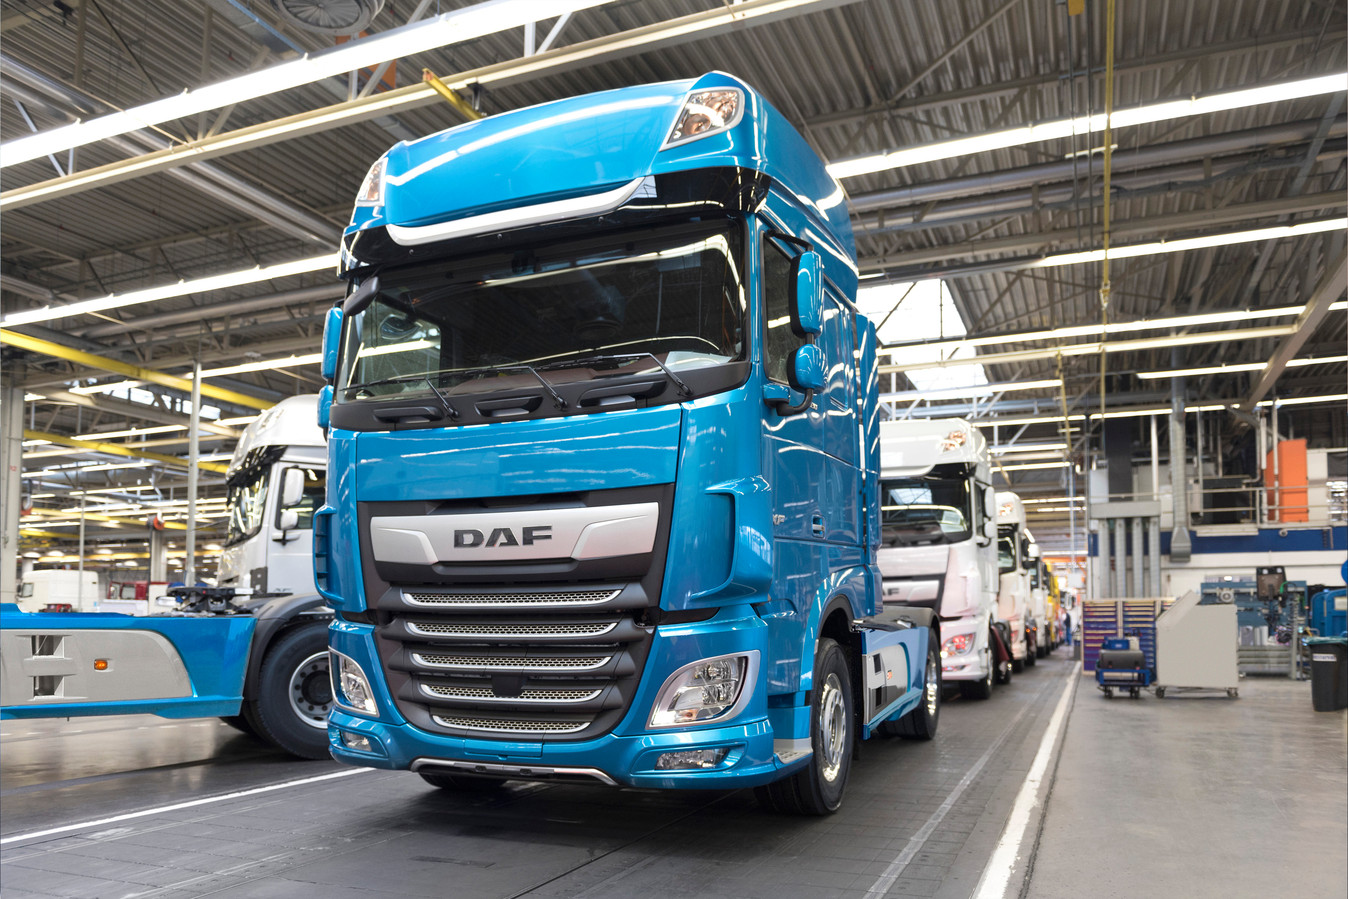 DAF productie in Eindhoven.